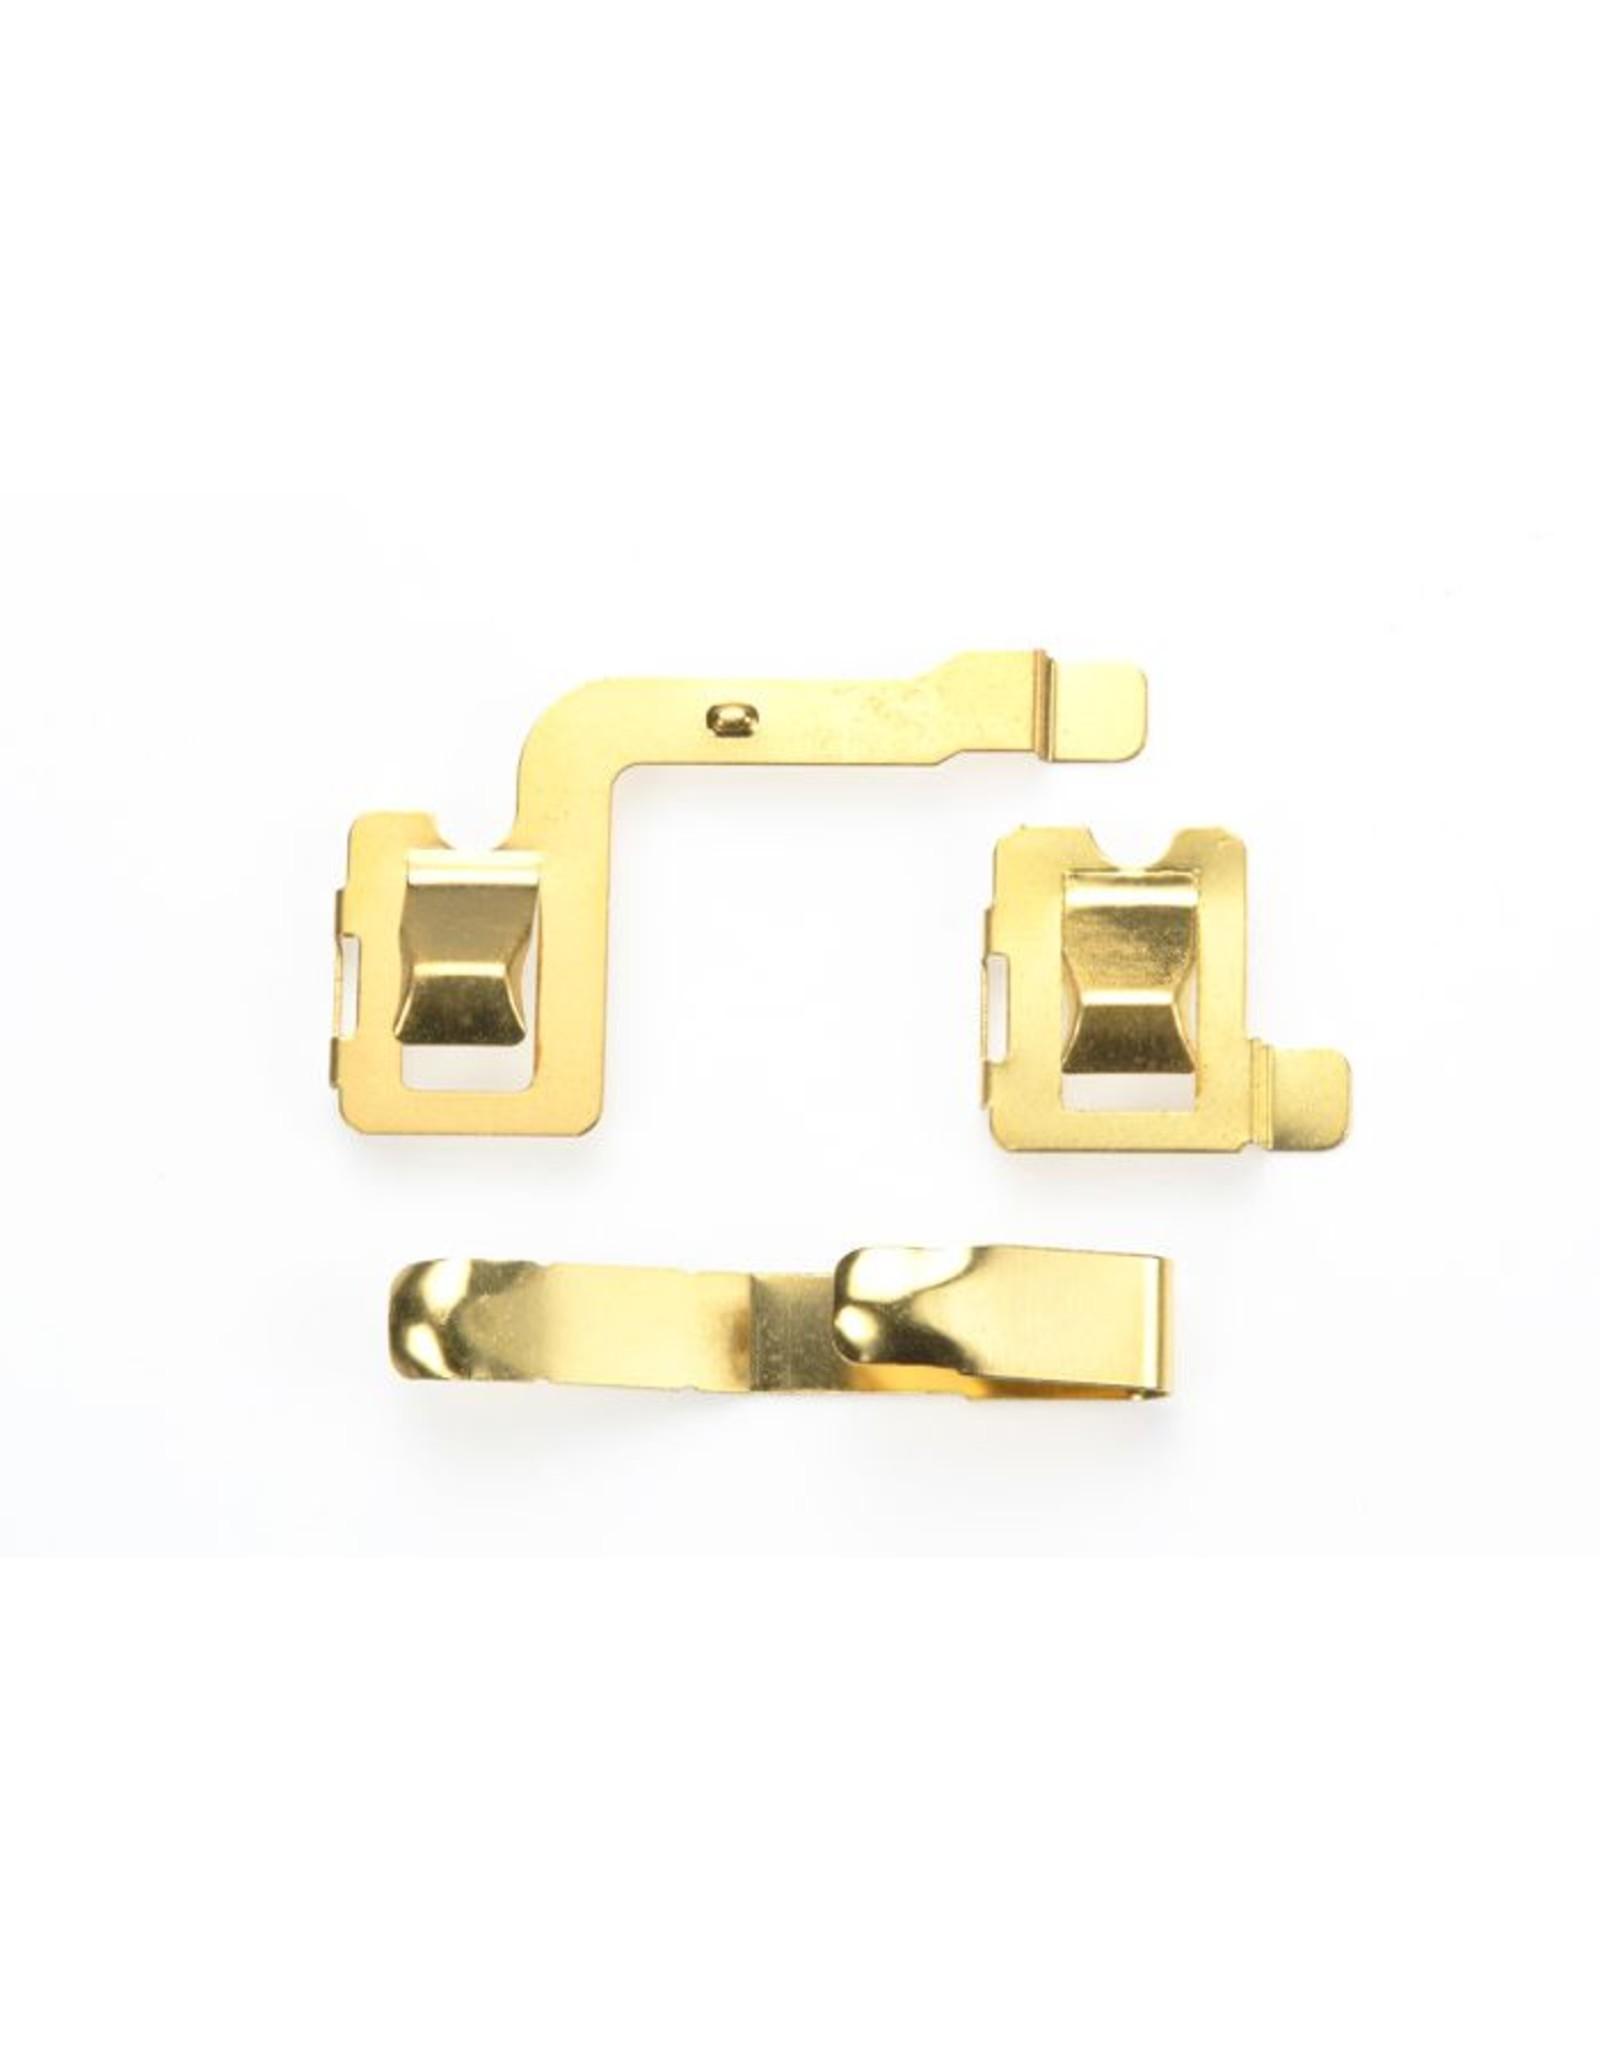 Tamiya Gold Plated Terminal Set  (TAM15421)